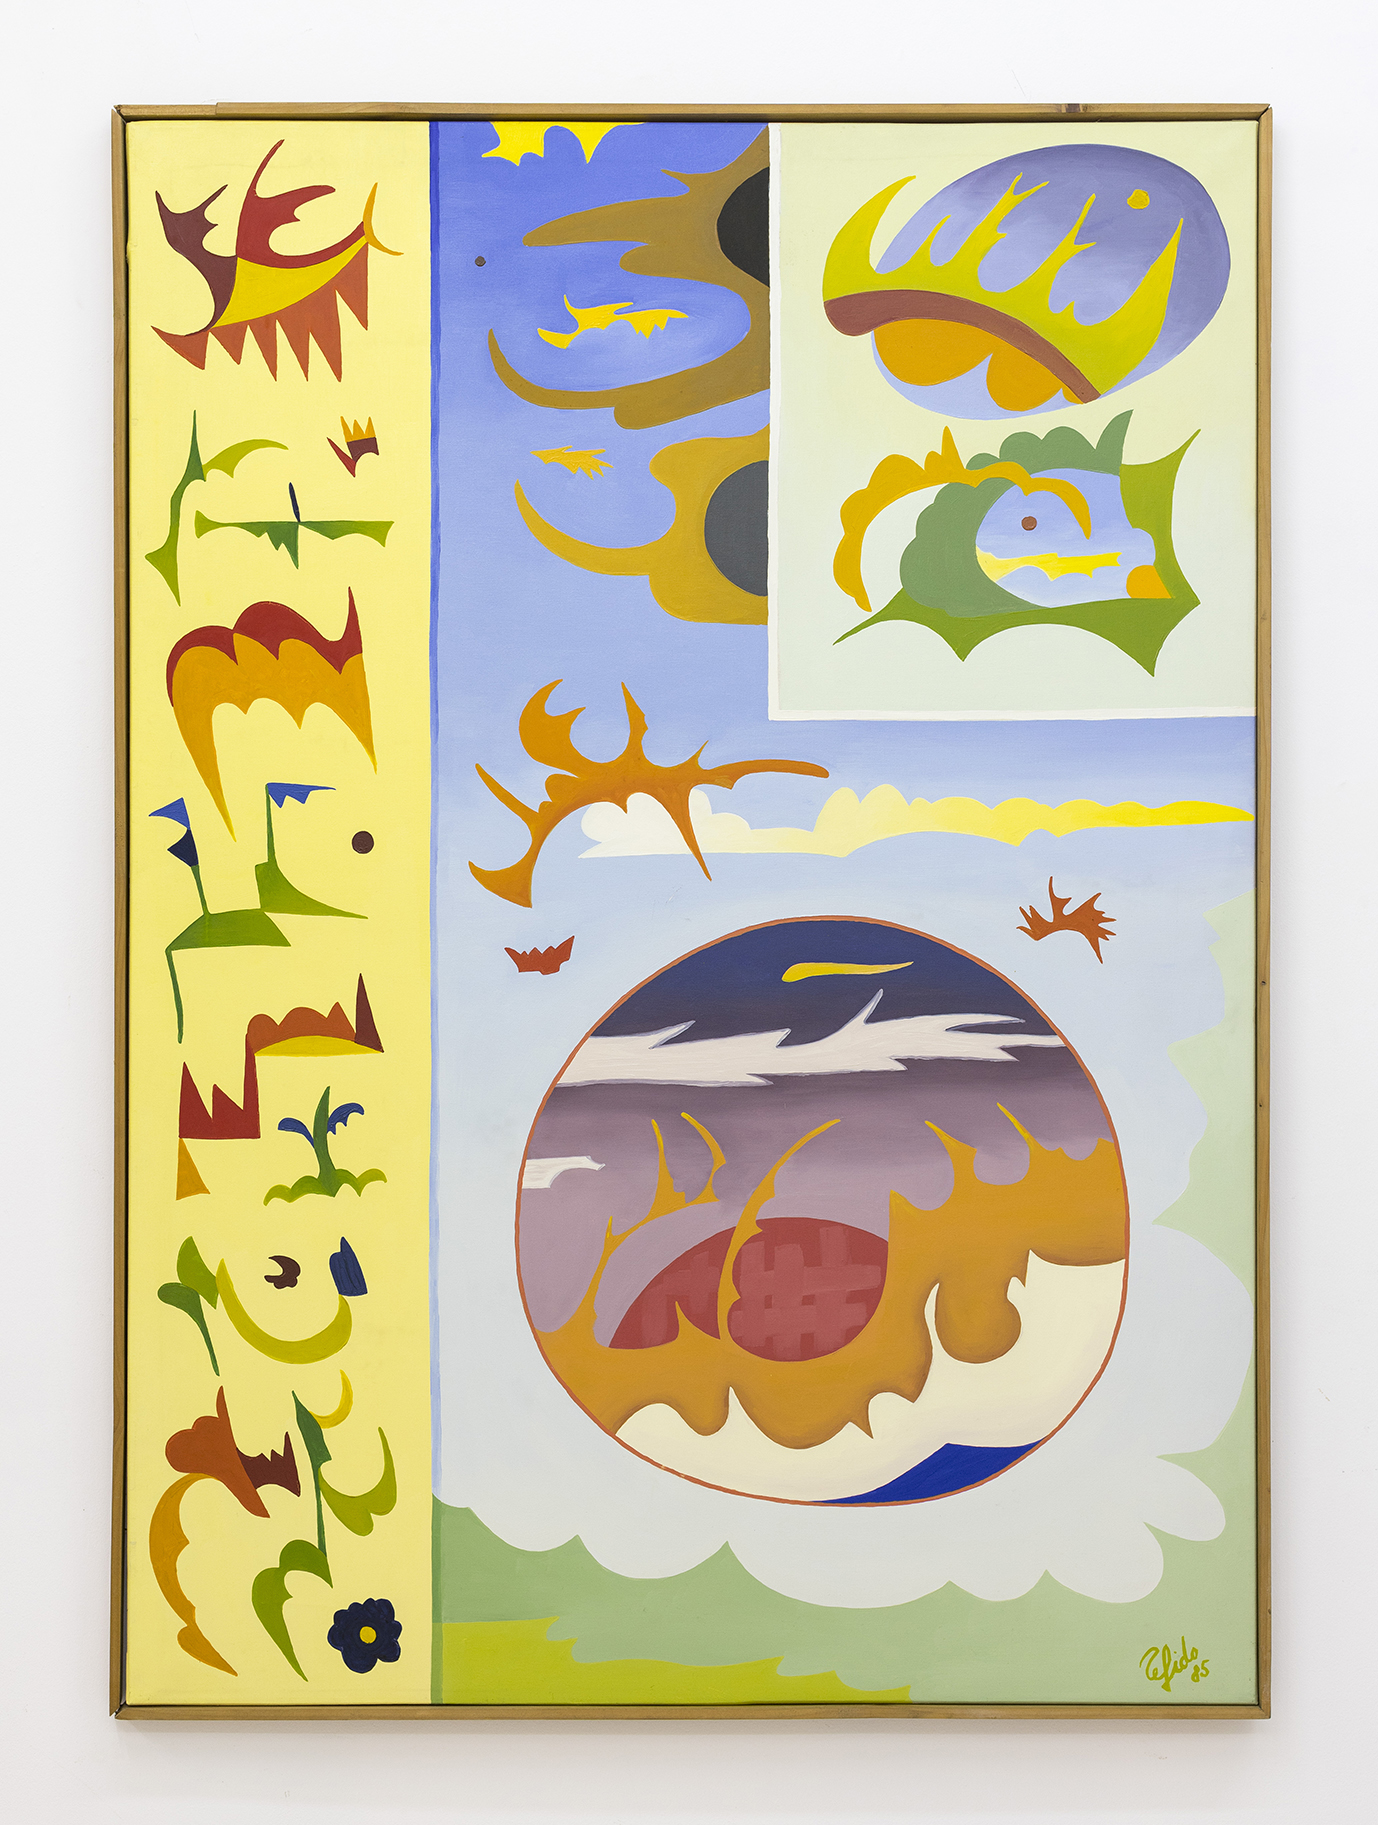 Lido Iacopetti Unimoj 942 85 oleo sobre tela 140 x 100 cm 1985.jpg